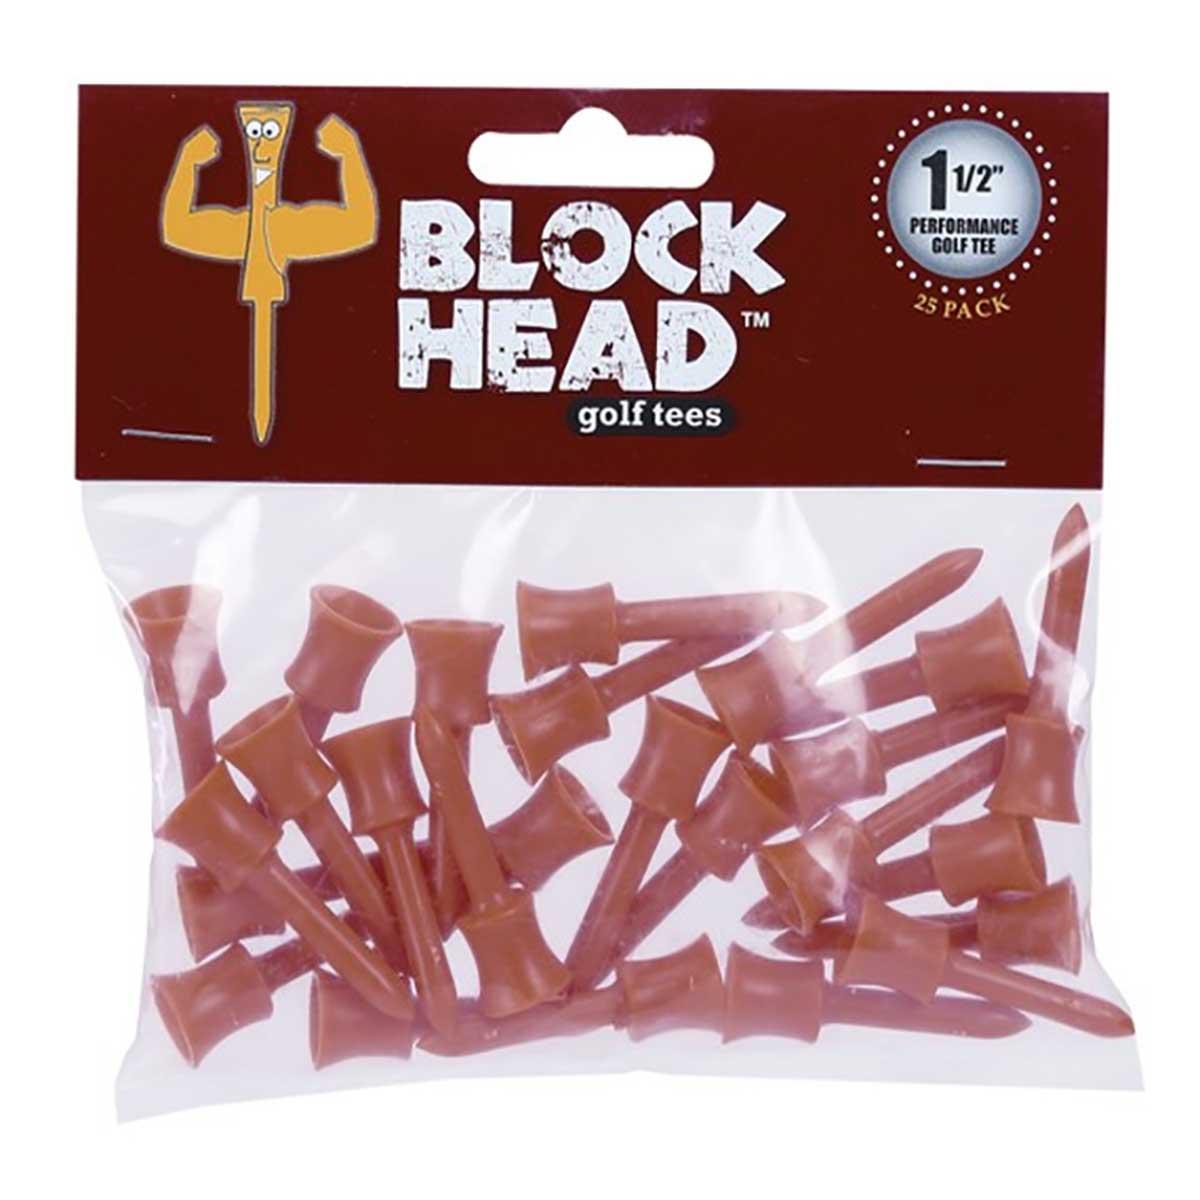 Global Tour Golf Block Head Tees - 25 Pack